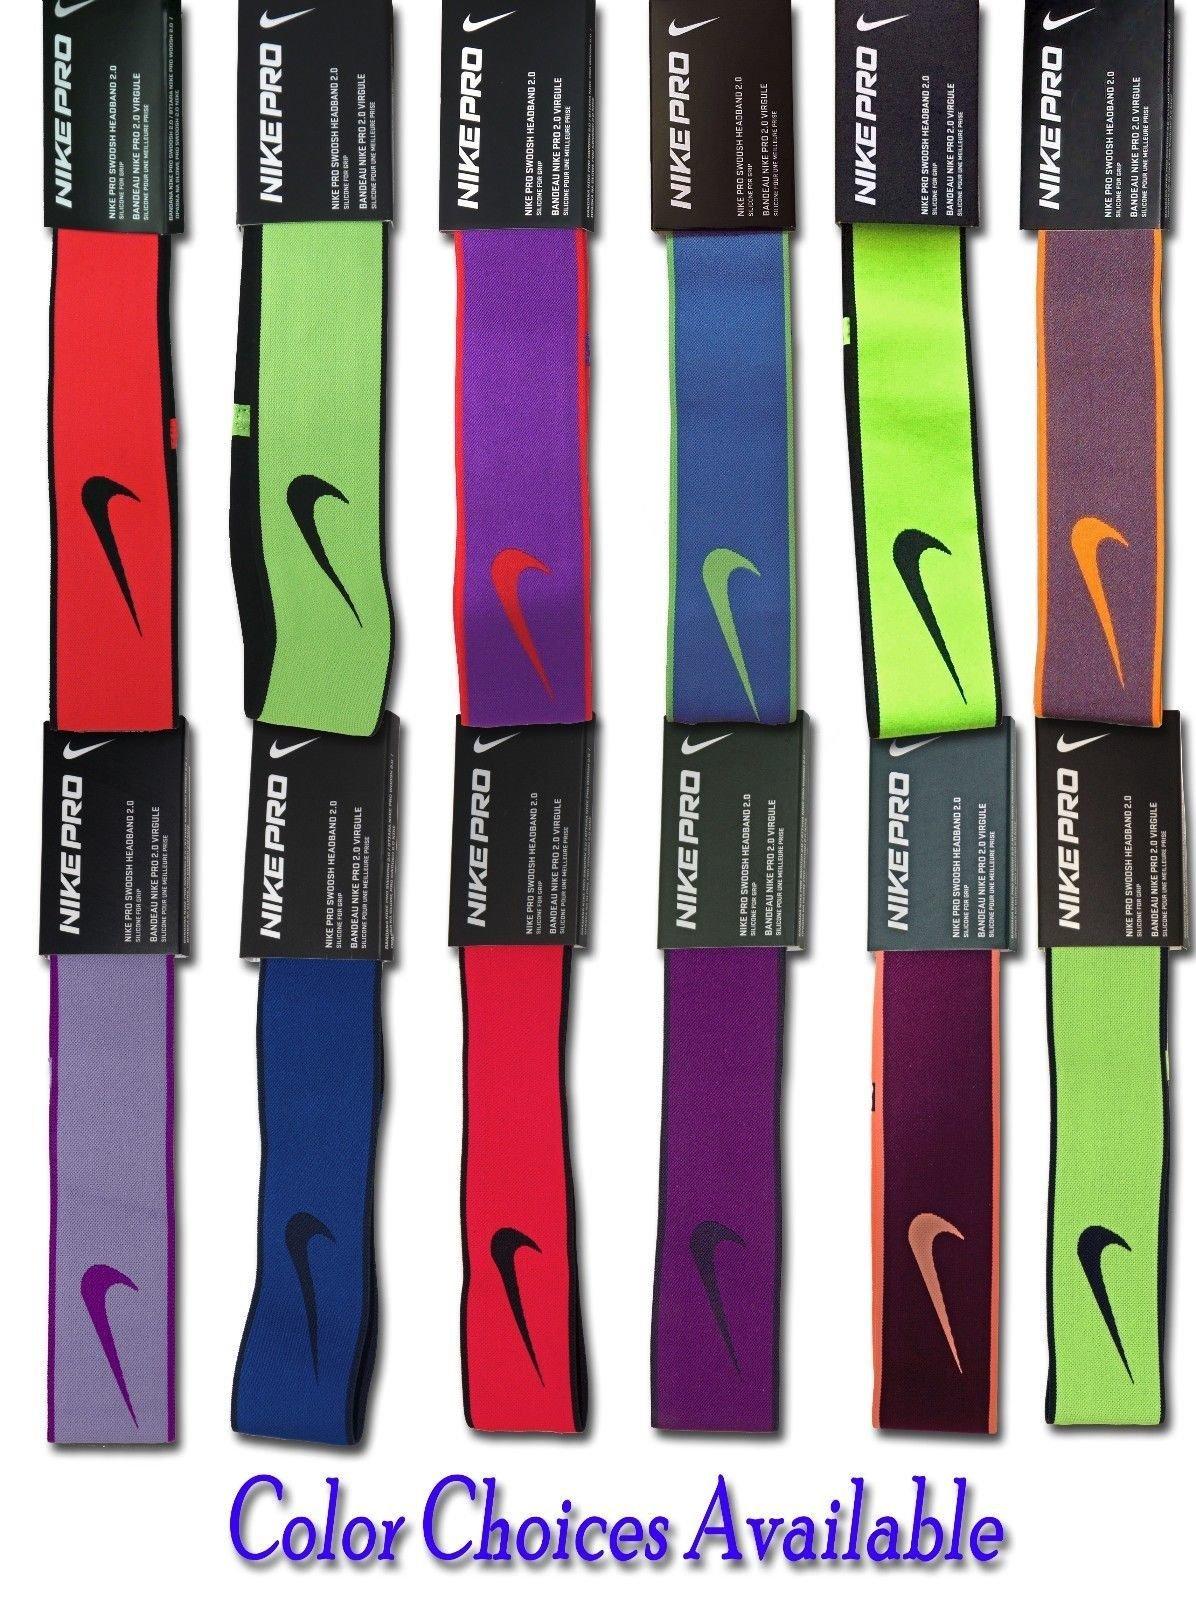 Nike Pro Swoosh 2.0 Headband -Several Choices 14762